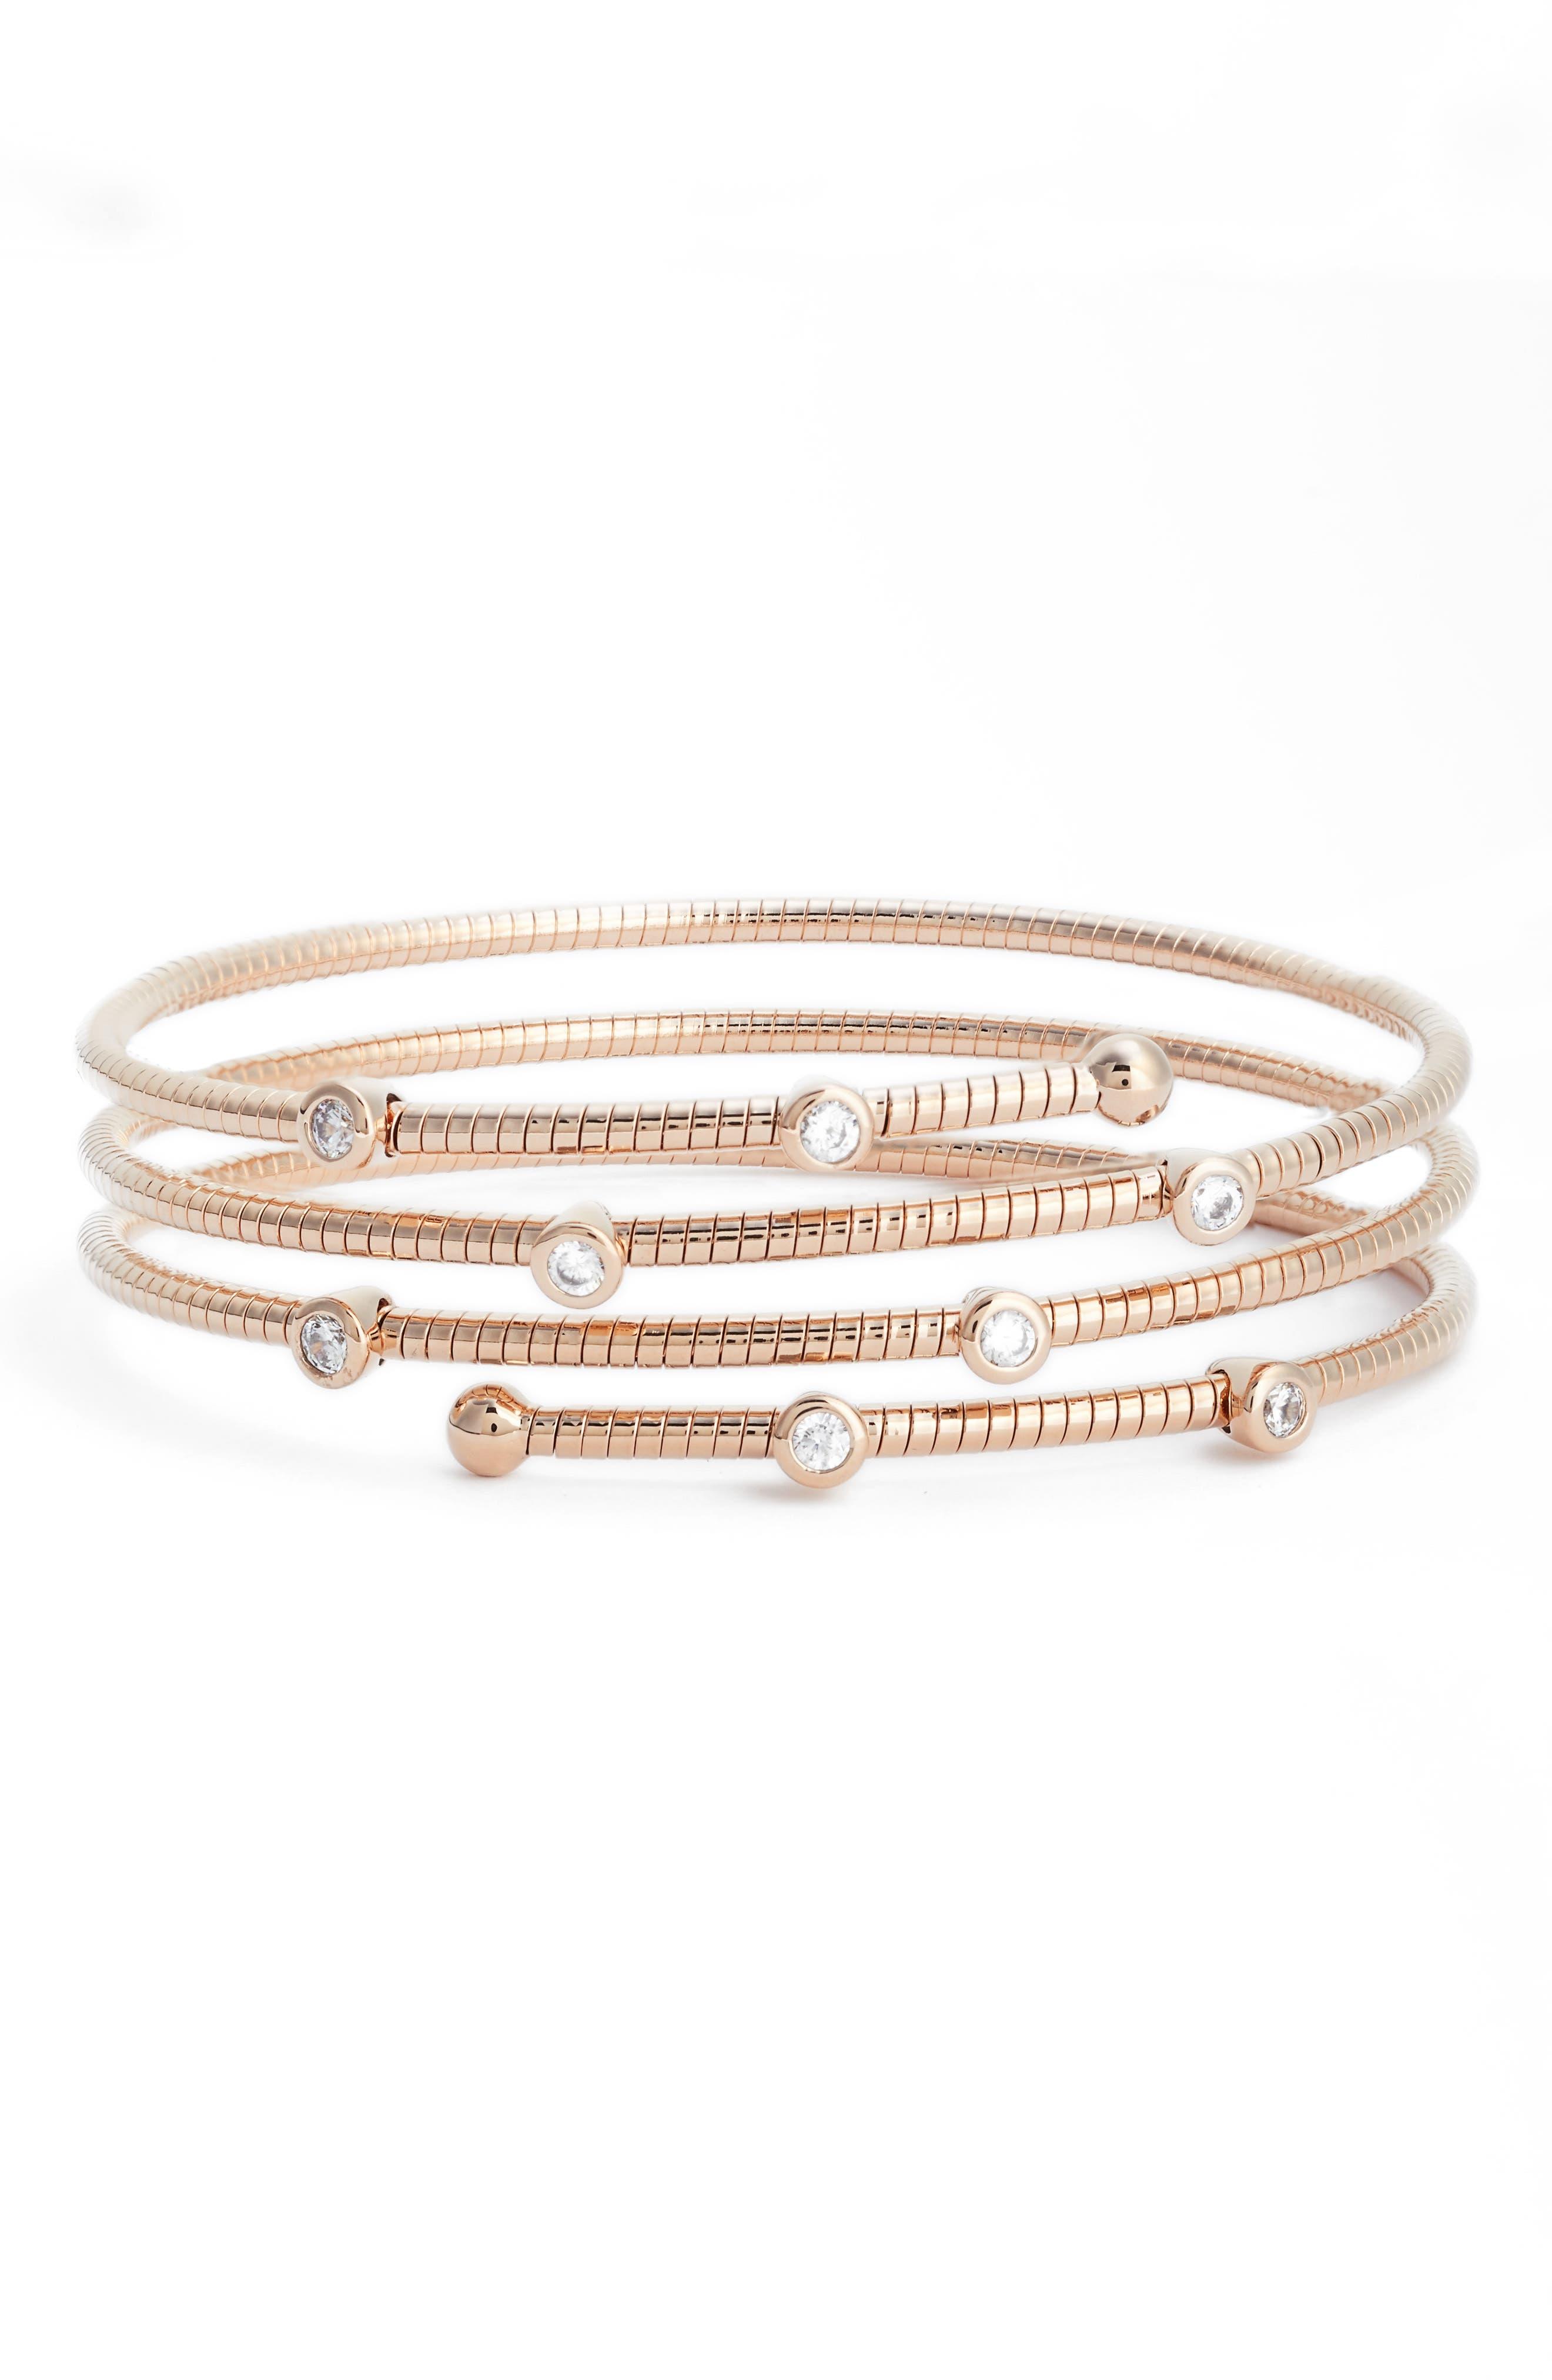 Cubic Zirconia Spiral Wrap Bracelet,                             Main thumbnail 1, color,                             Rose Gold/ Clear